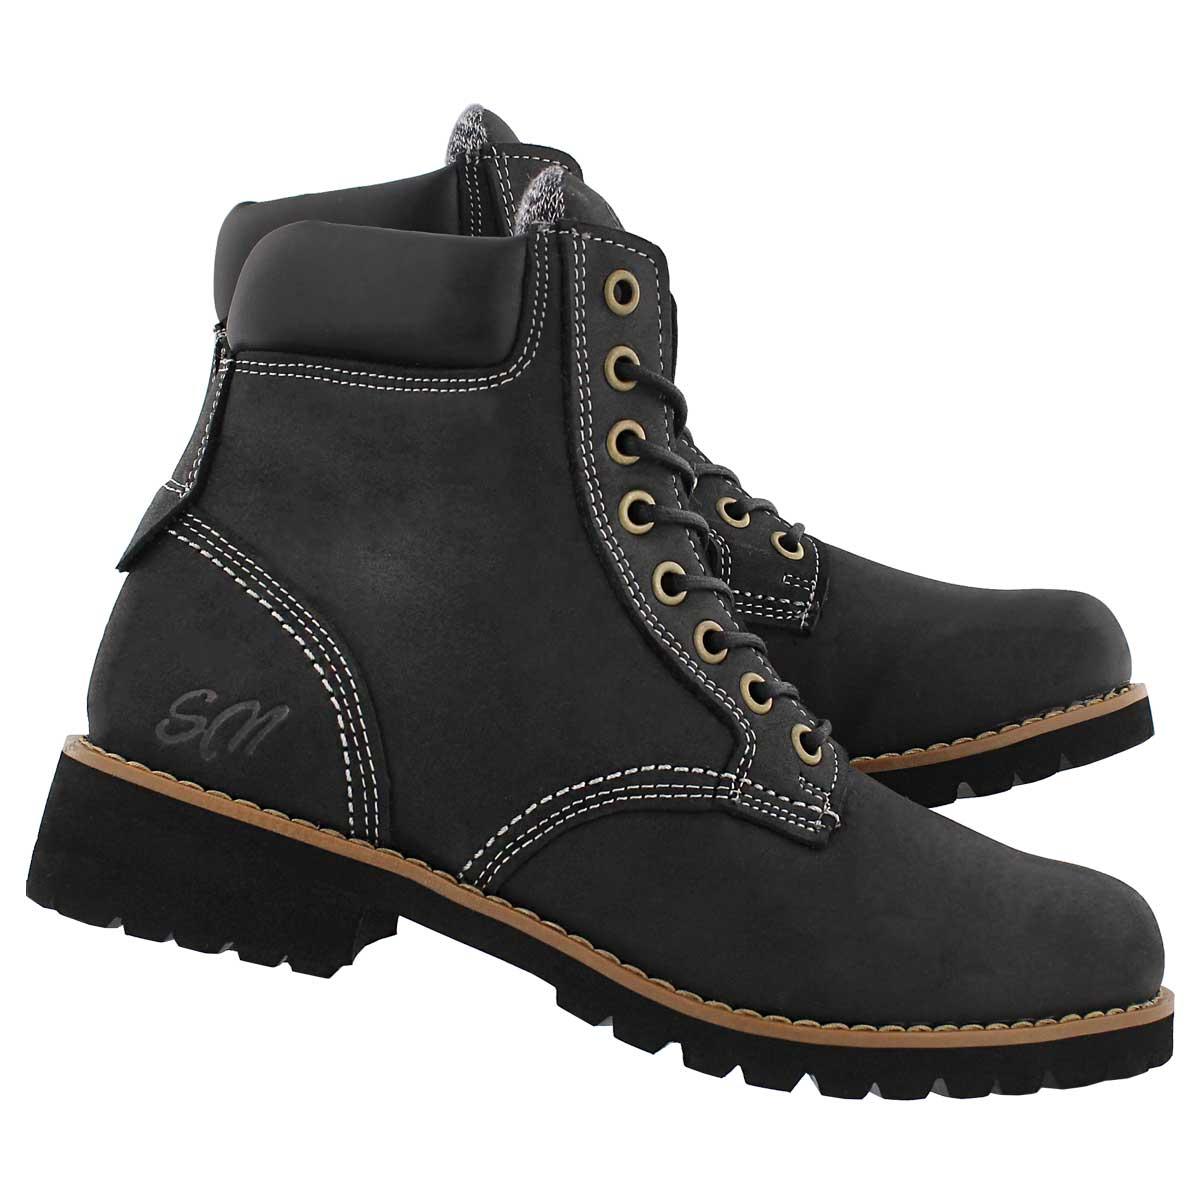 Lds Dalisse 2 black combat boot